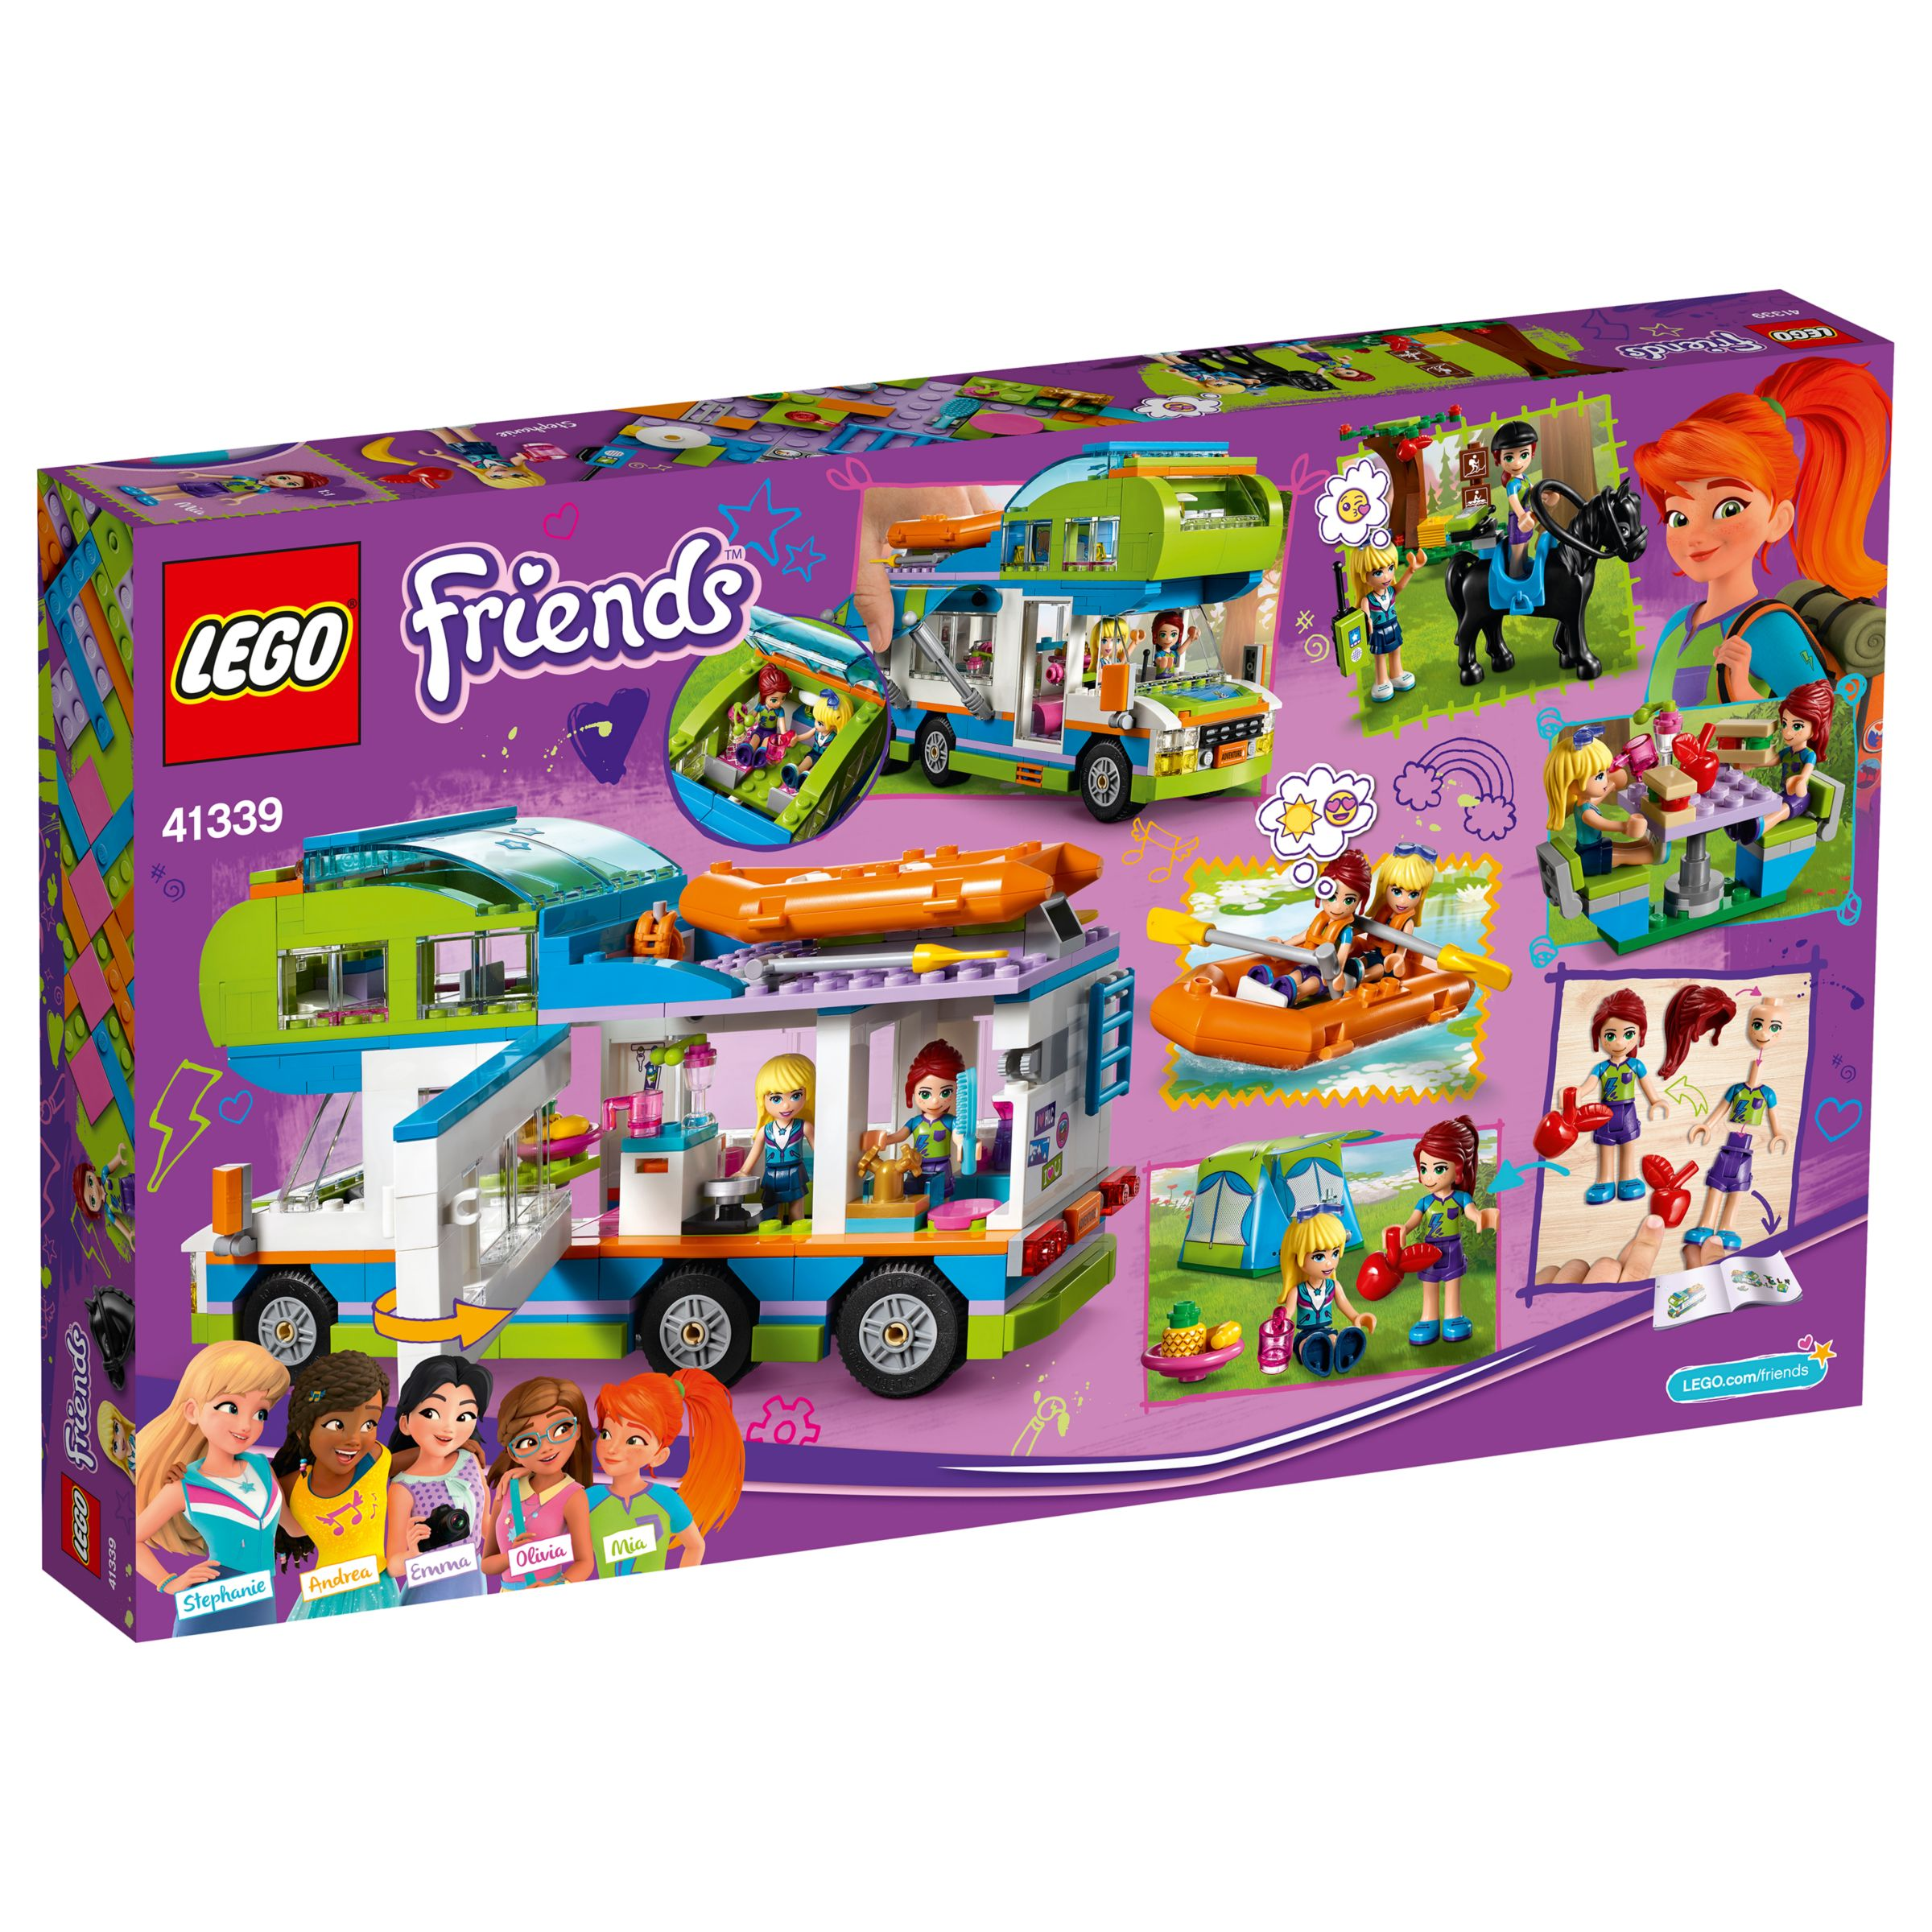 Lego Friends 41339 Mias Camper Van At John Lewis Partners